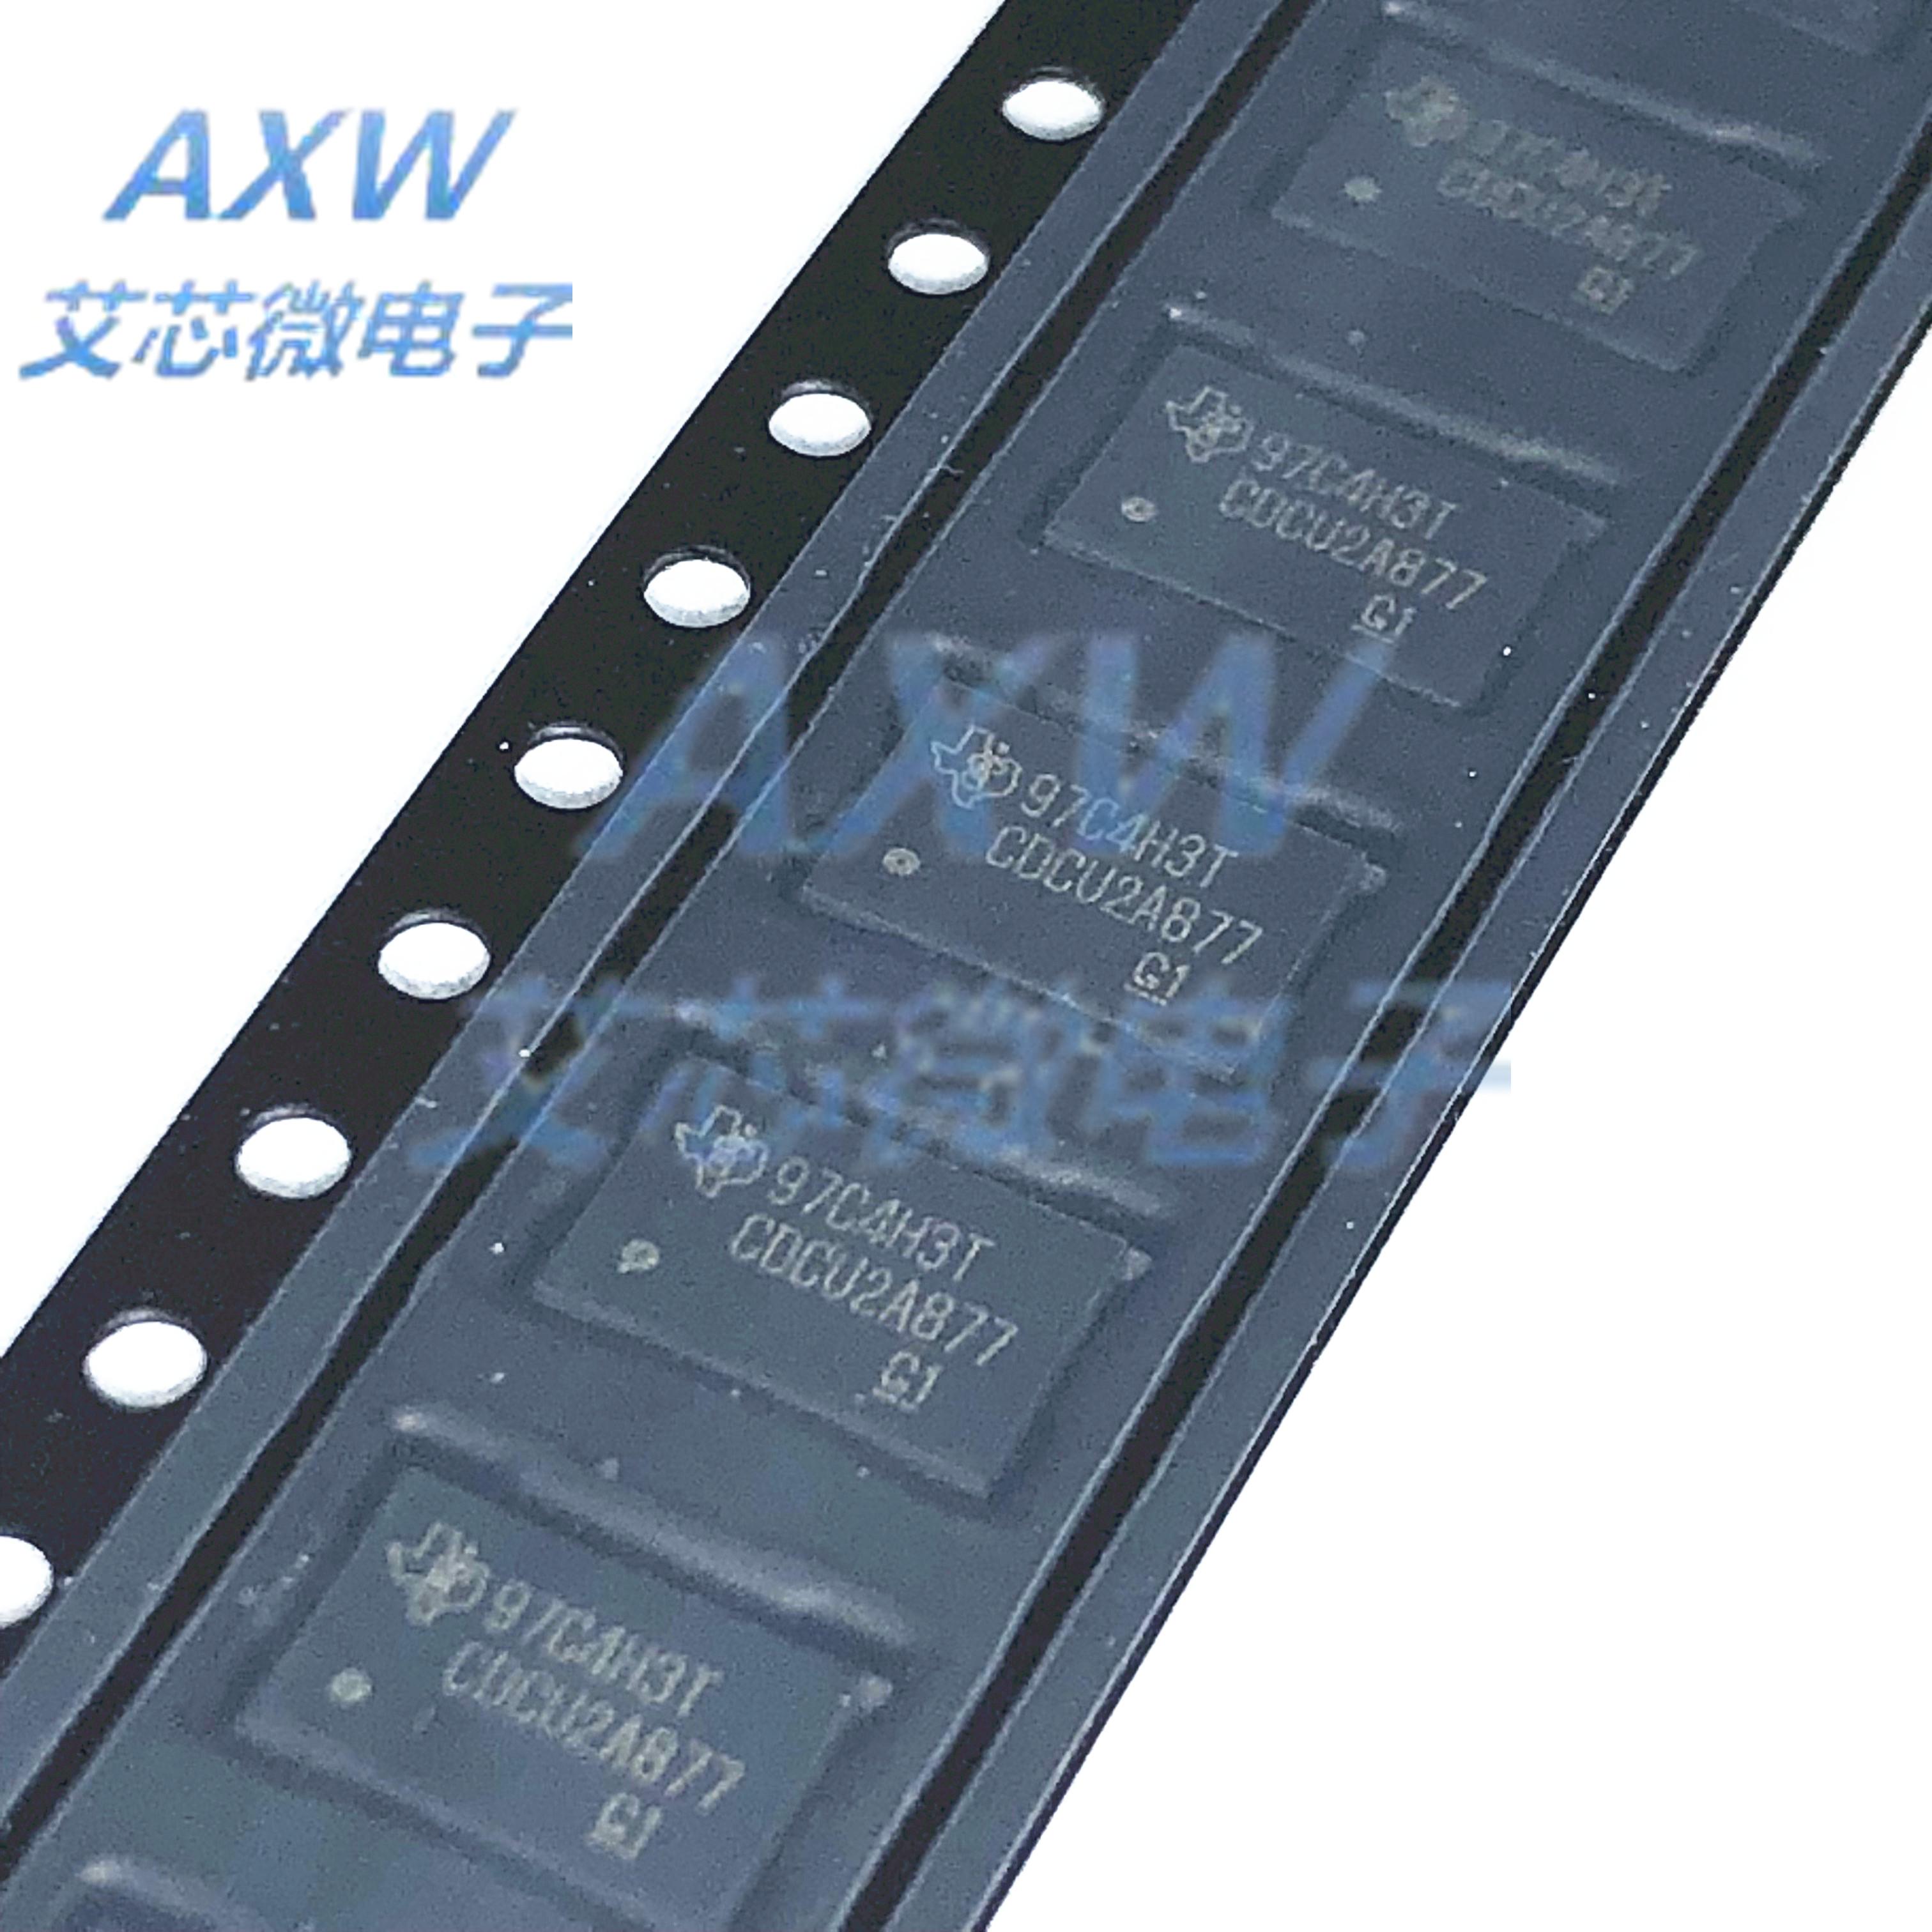 3 26 Cdcu2a877zqlr Cdcu2a877 Vfbga 52 Clock Timing Memory Ddr2 Sstl18 From Best Taobao Agent Taobao International International Ecommerce Newbecca Com